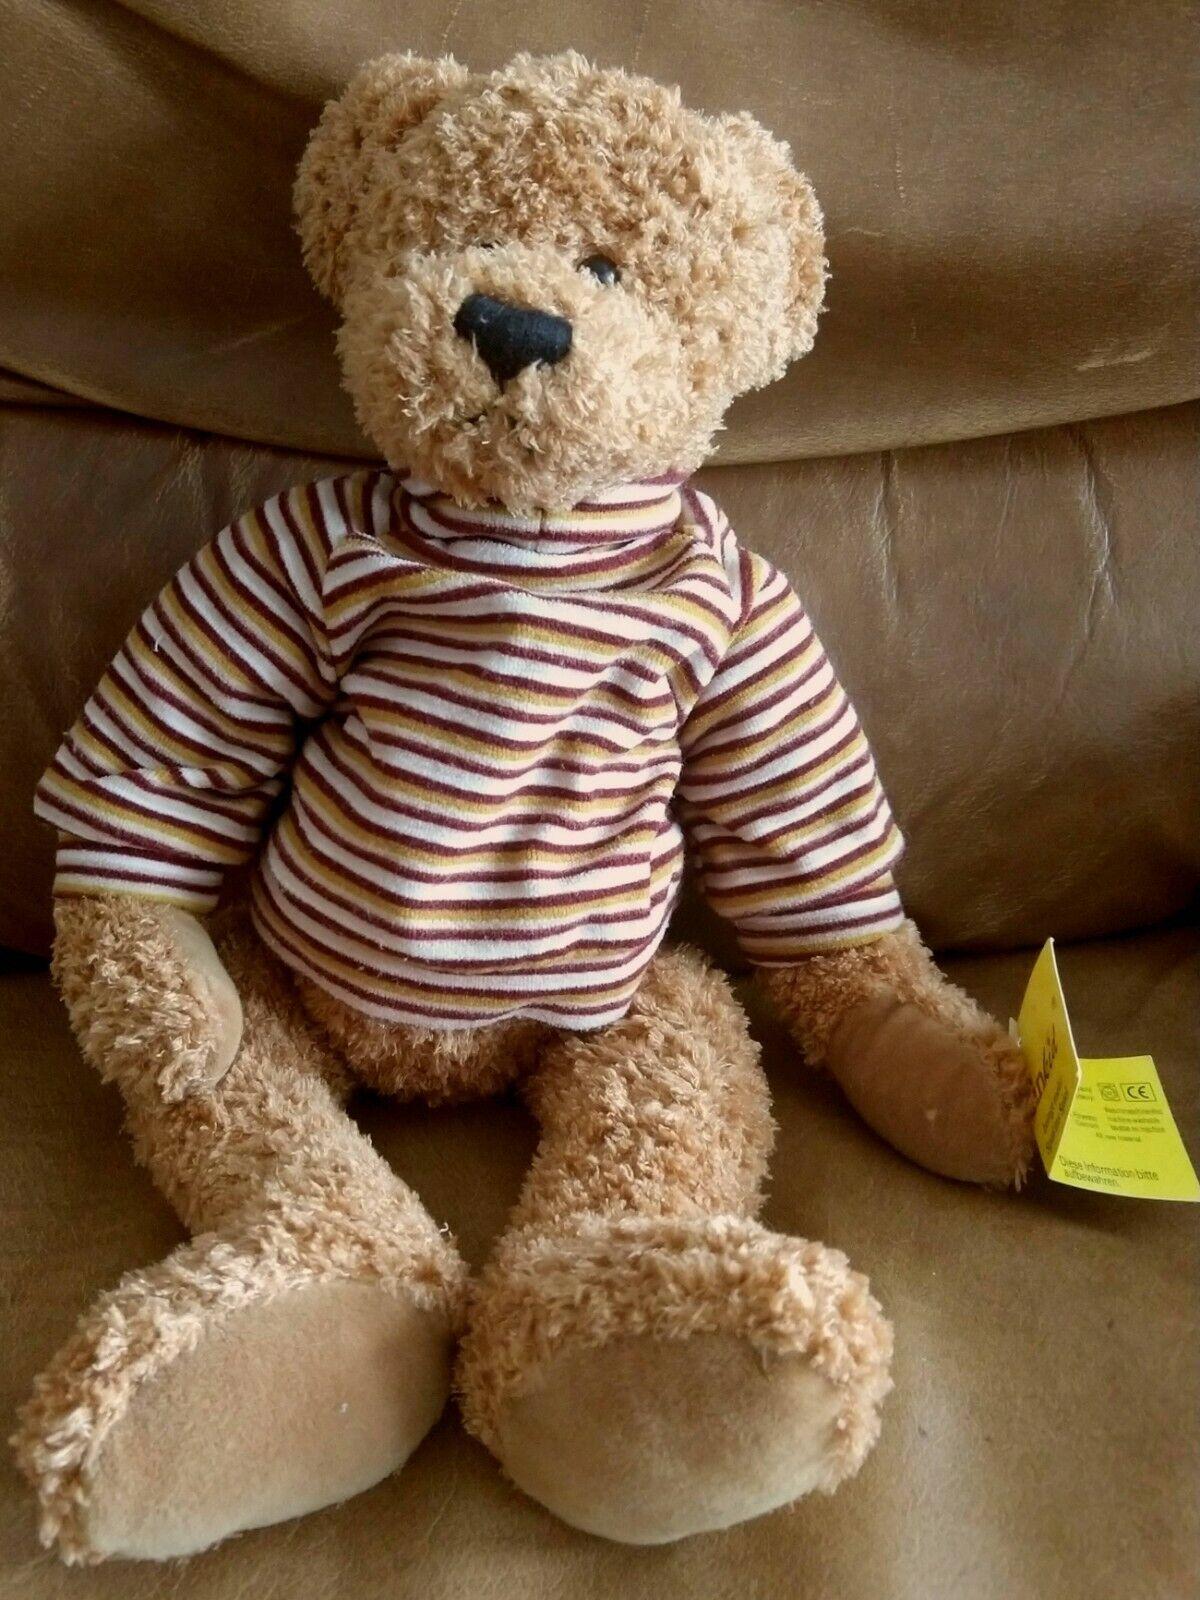 Sunkid braun Plush Teddy Bear with a striped turtle neck Germany w  Tag vintage